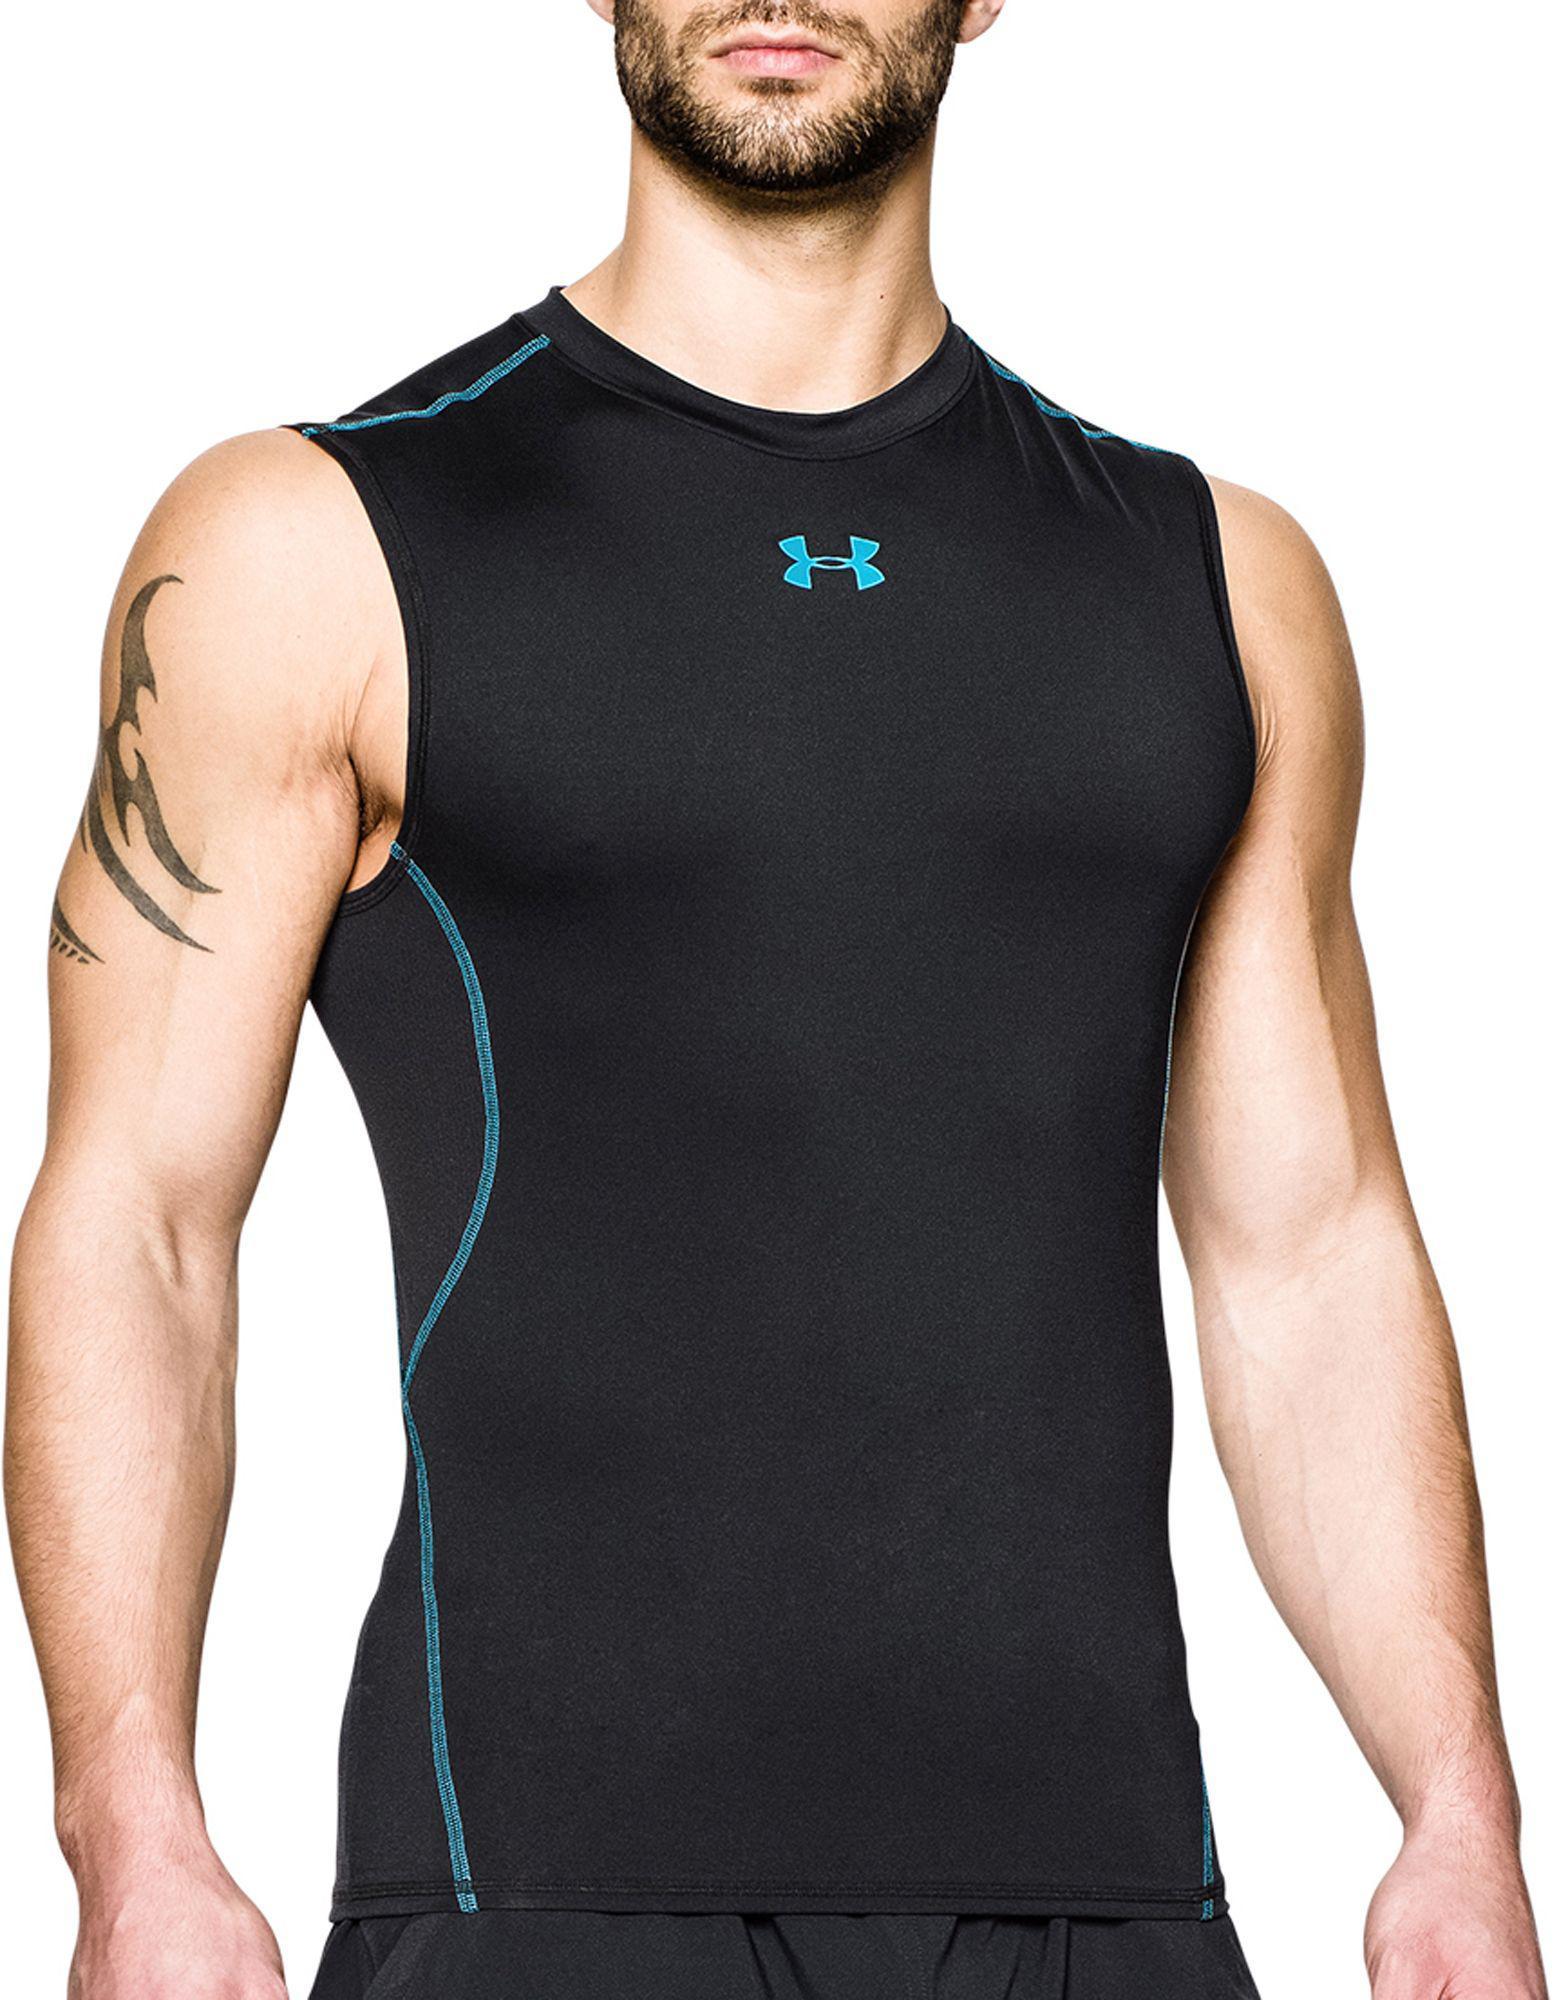 53df0003a5d2c Lyst - Under Armour Heatgear Armour Sleeveless Shirt in Black for Men